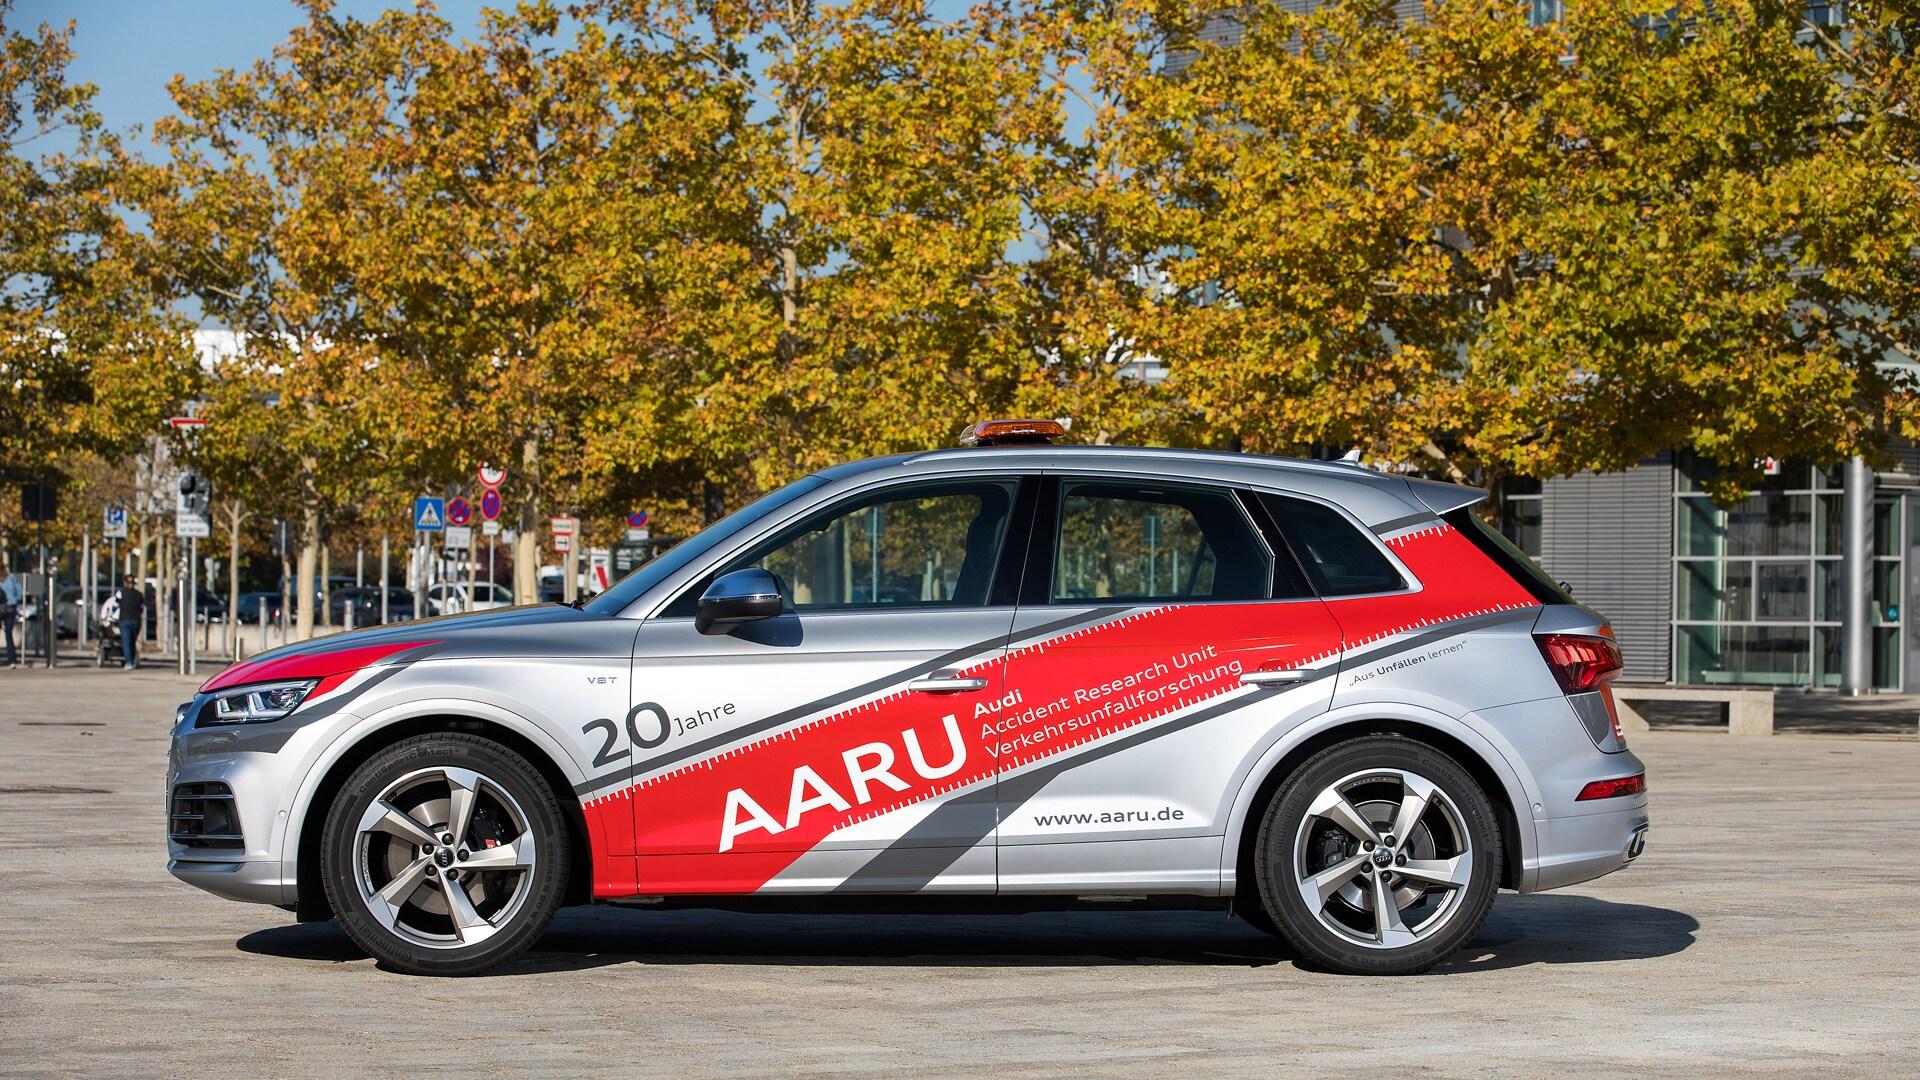 Vozilo enote AARU (Audi Accident Research Unit).